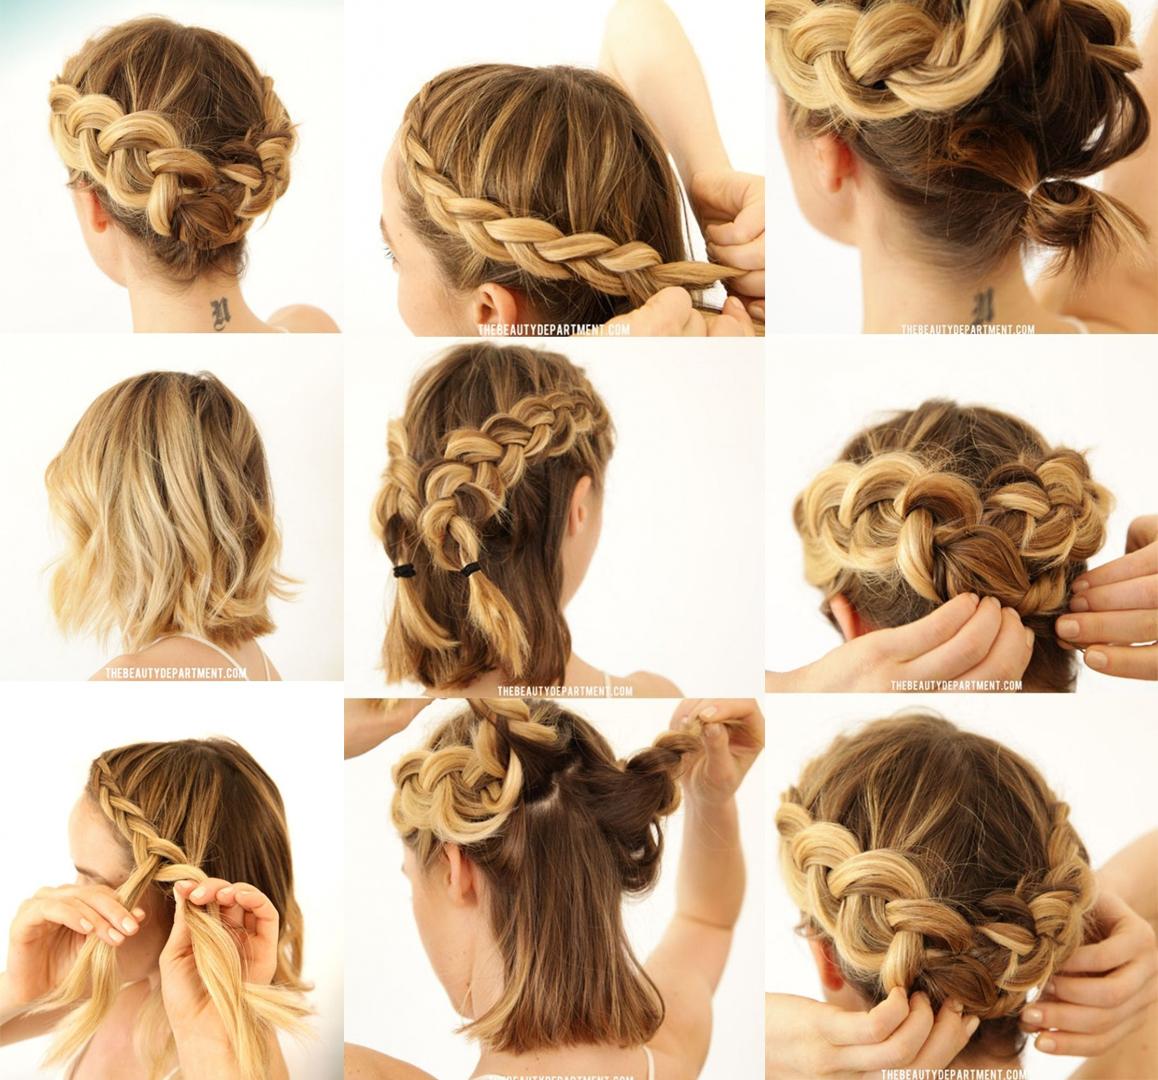 15 Peinados Para Melenas Que Te Daran Un Look Con Estilo - Peinados-para-melenas-cortas